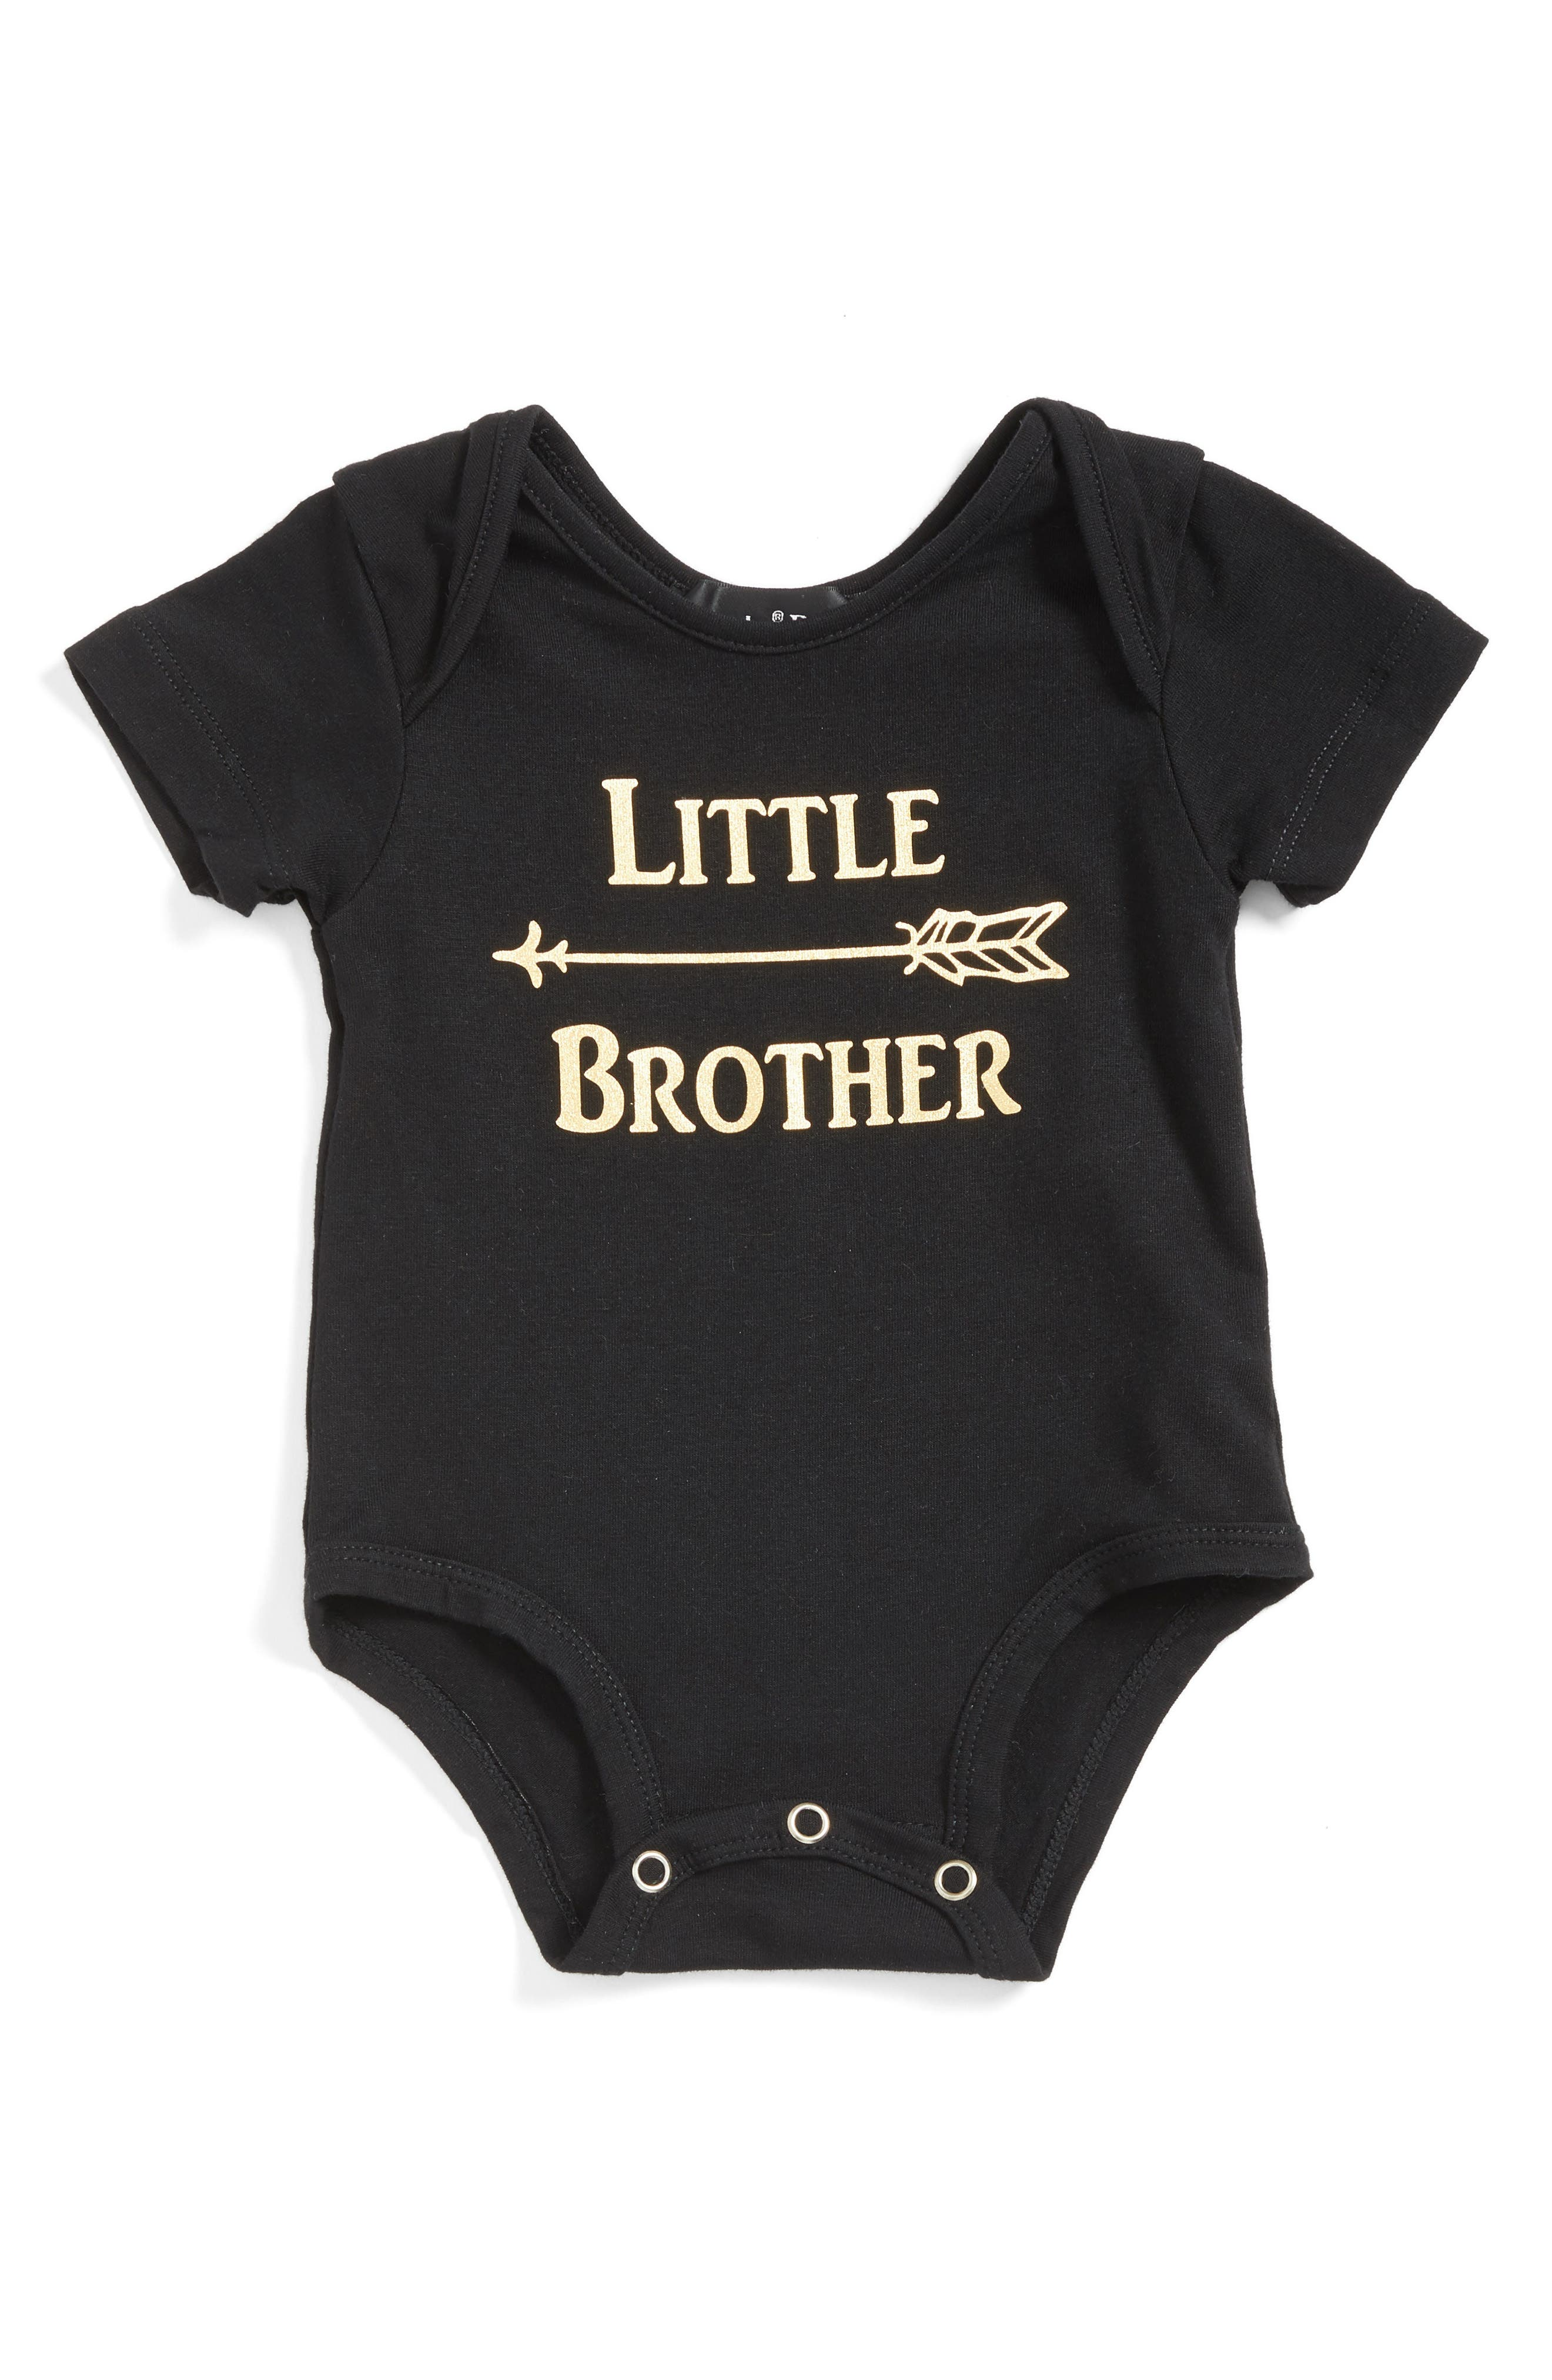 Little Brother Bodysuit,                             Main thumbnail 1, color,                             BLACK